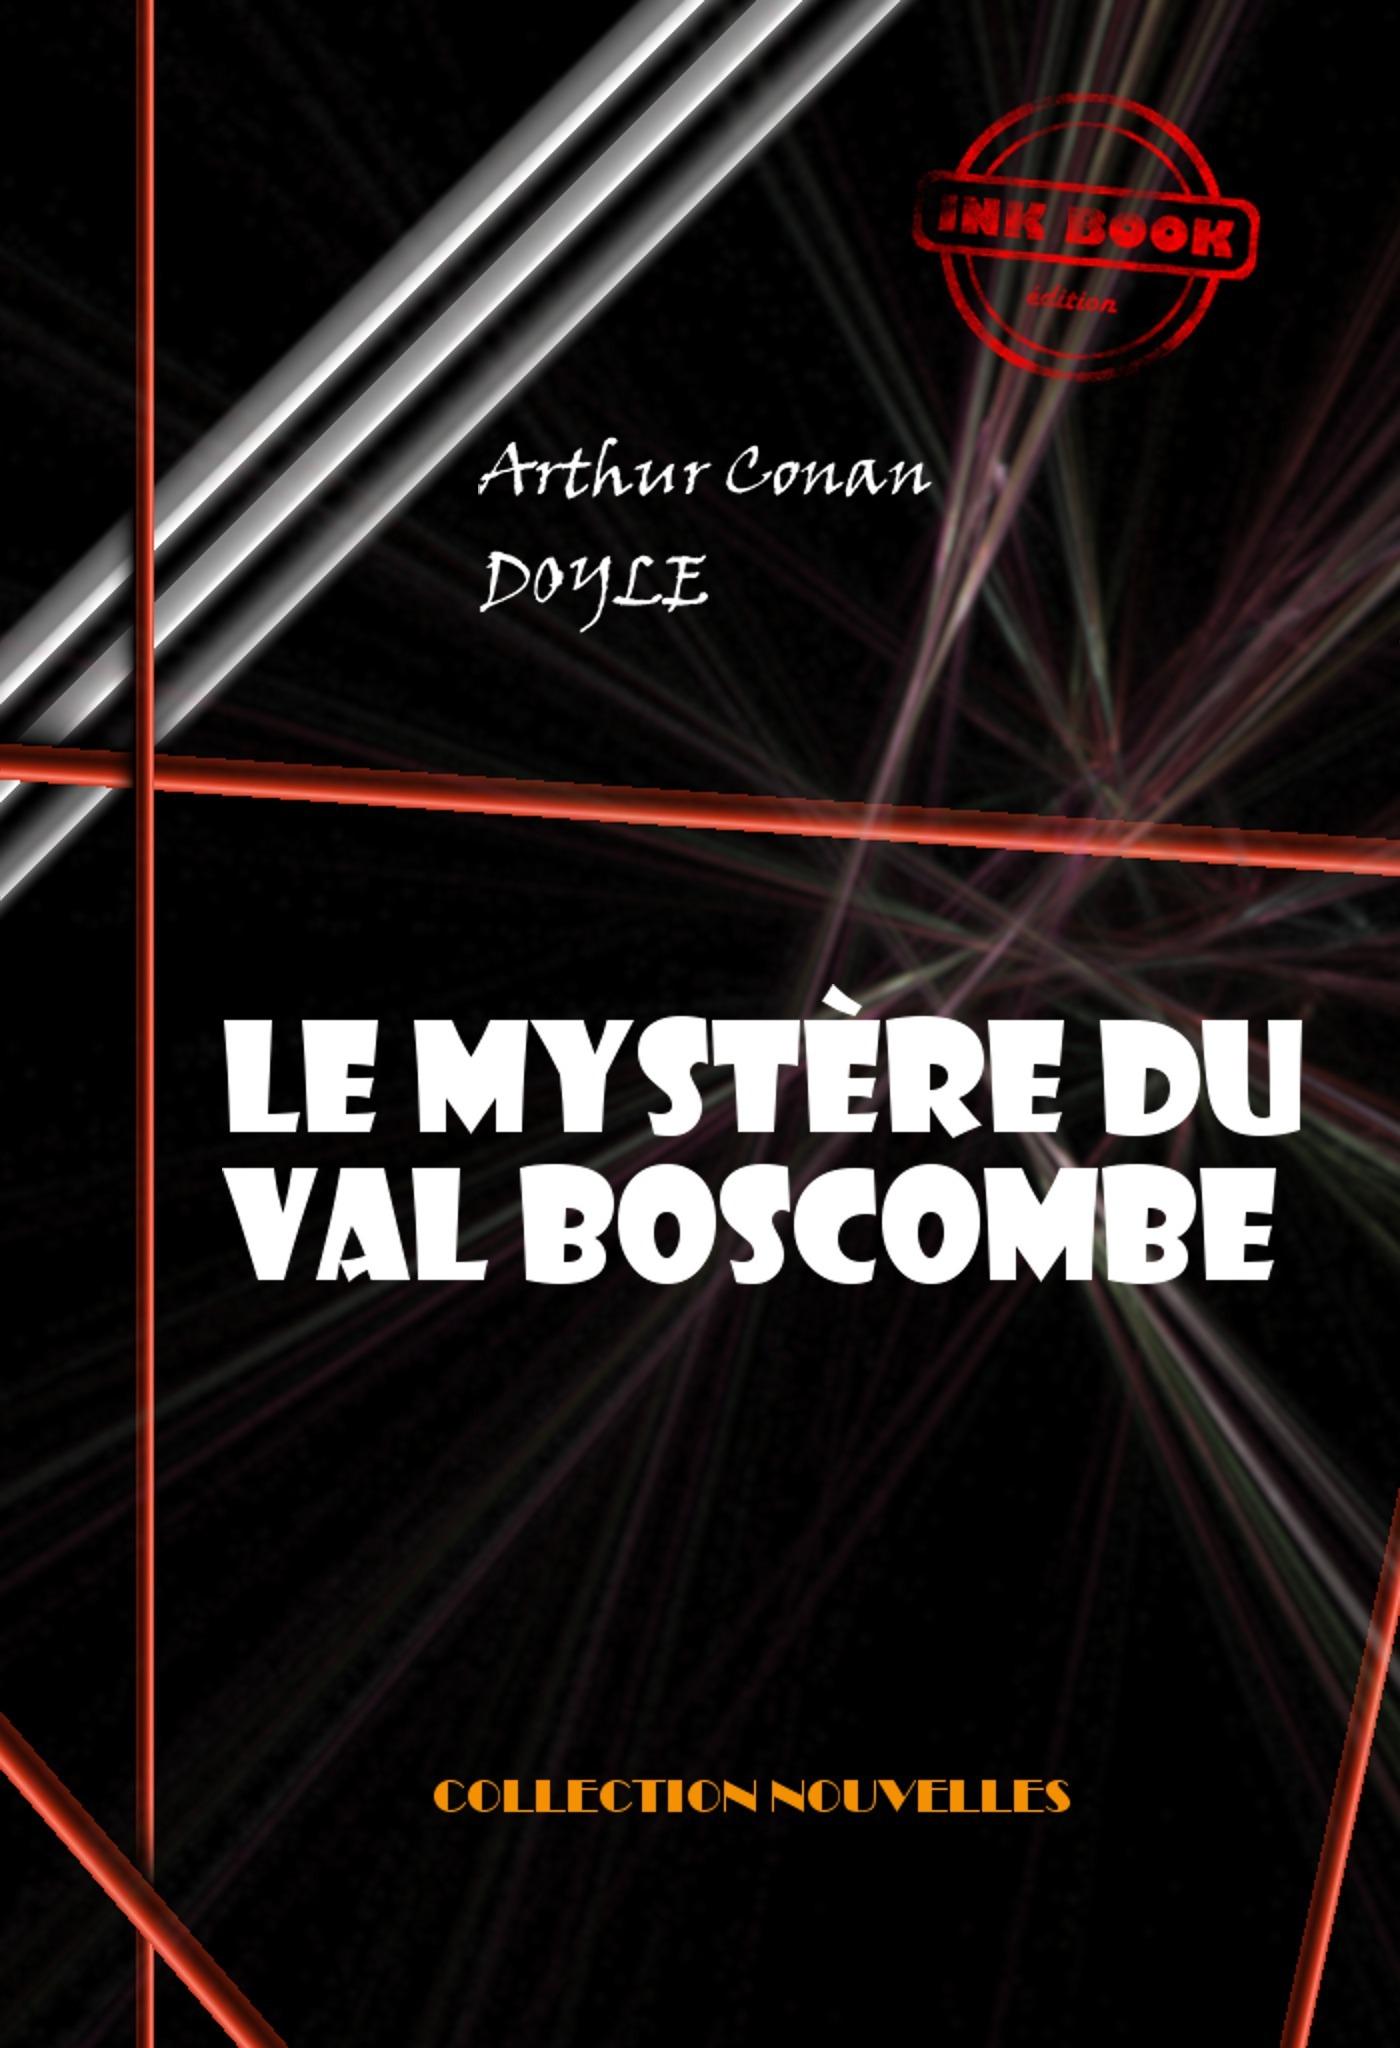 Le mystère du val Boscombe